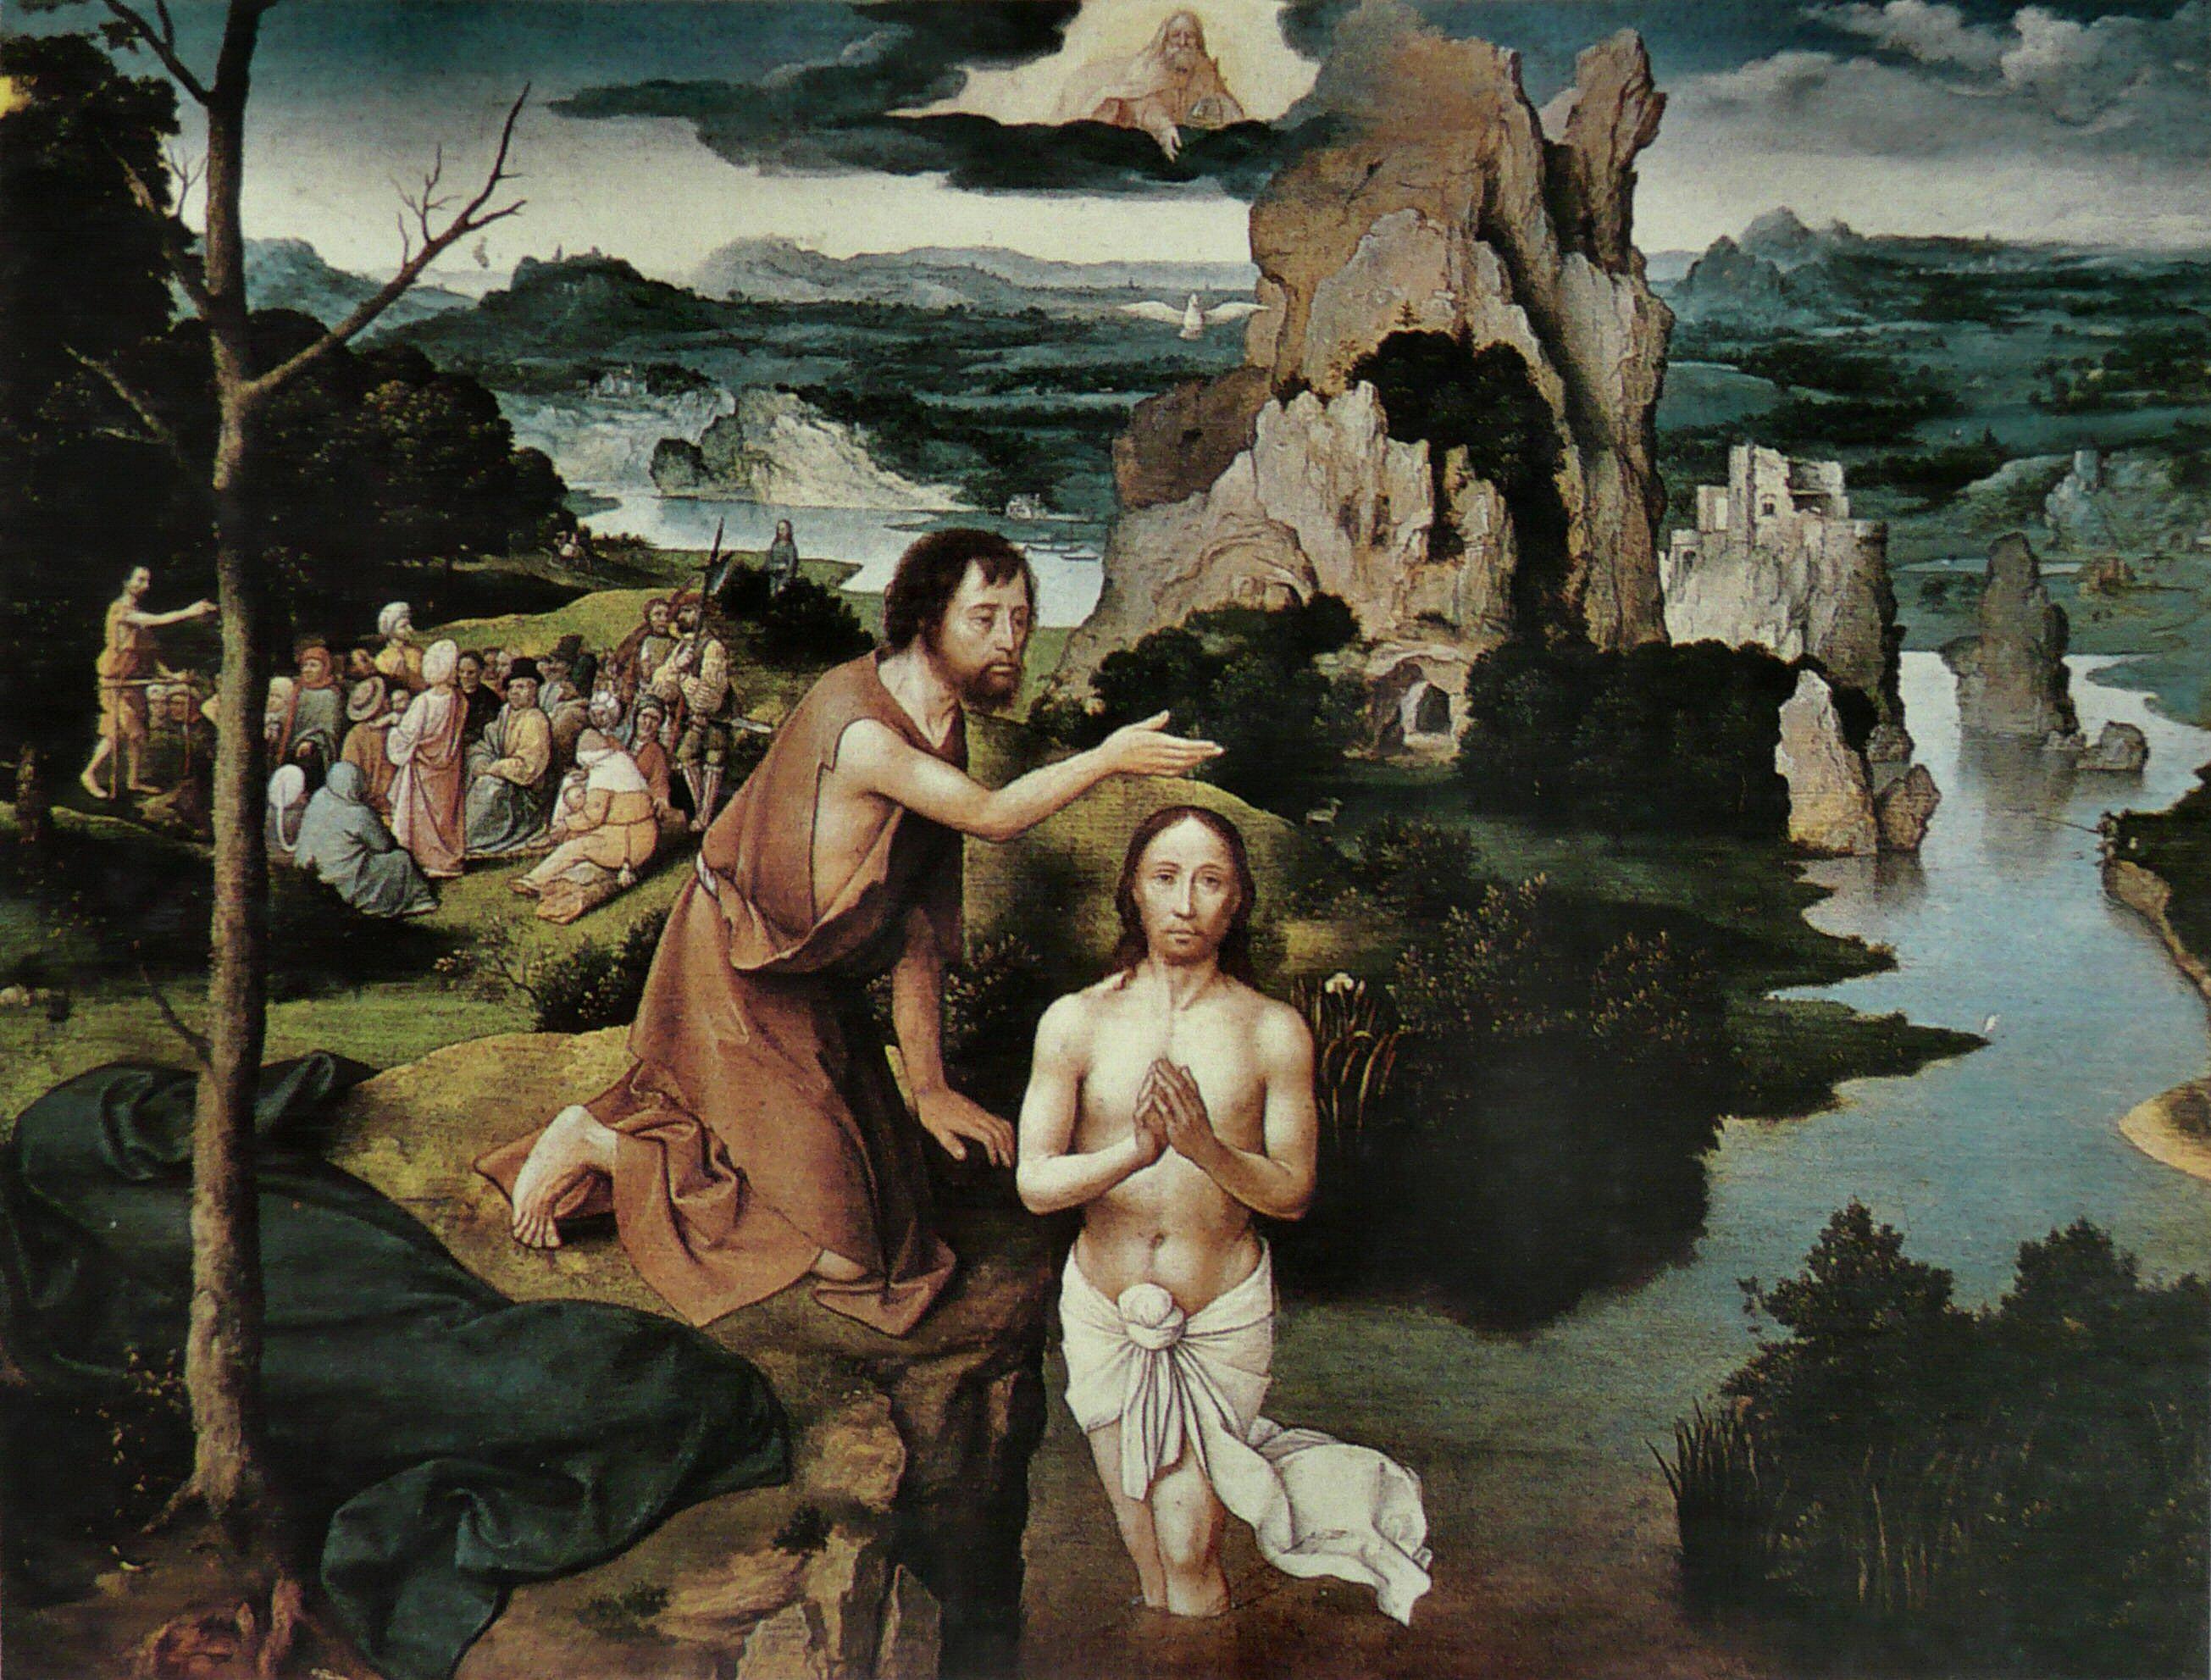 https://upload.wikimedia.org/wikipedia/commons/f/fb/Joachim_Patinir_-_Le_Bapt%C3%AAme_du_Christ.jpg